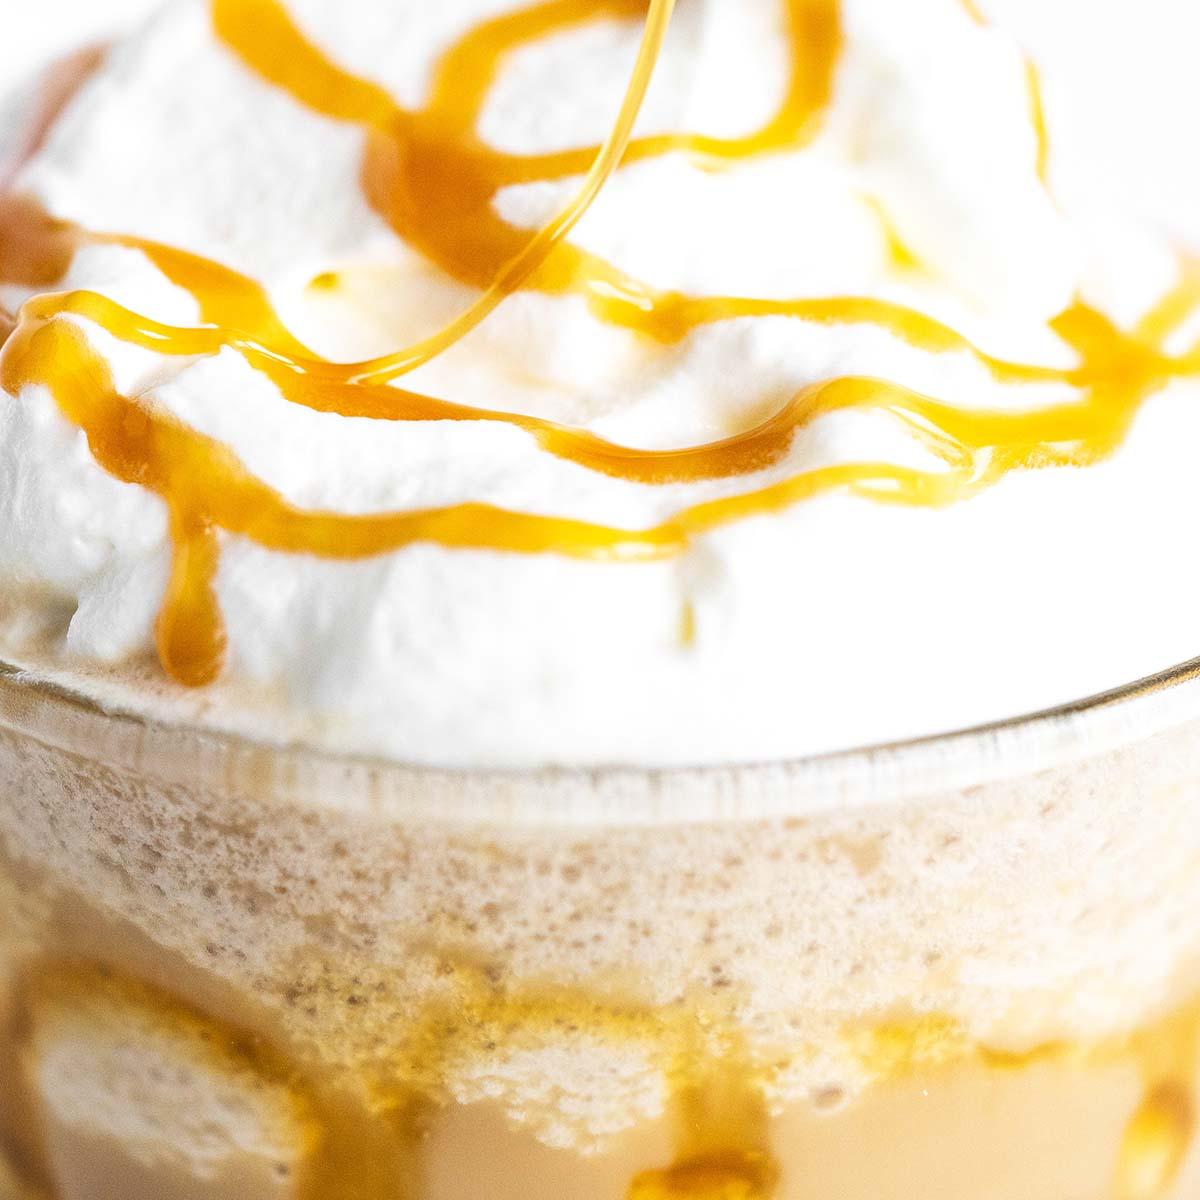 copycat starbucks caramel frappuccino featured image